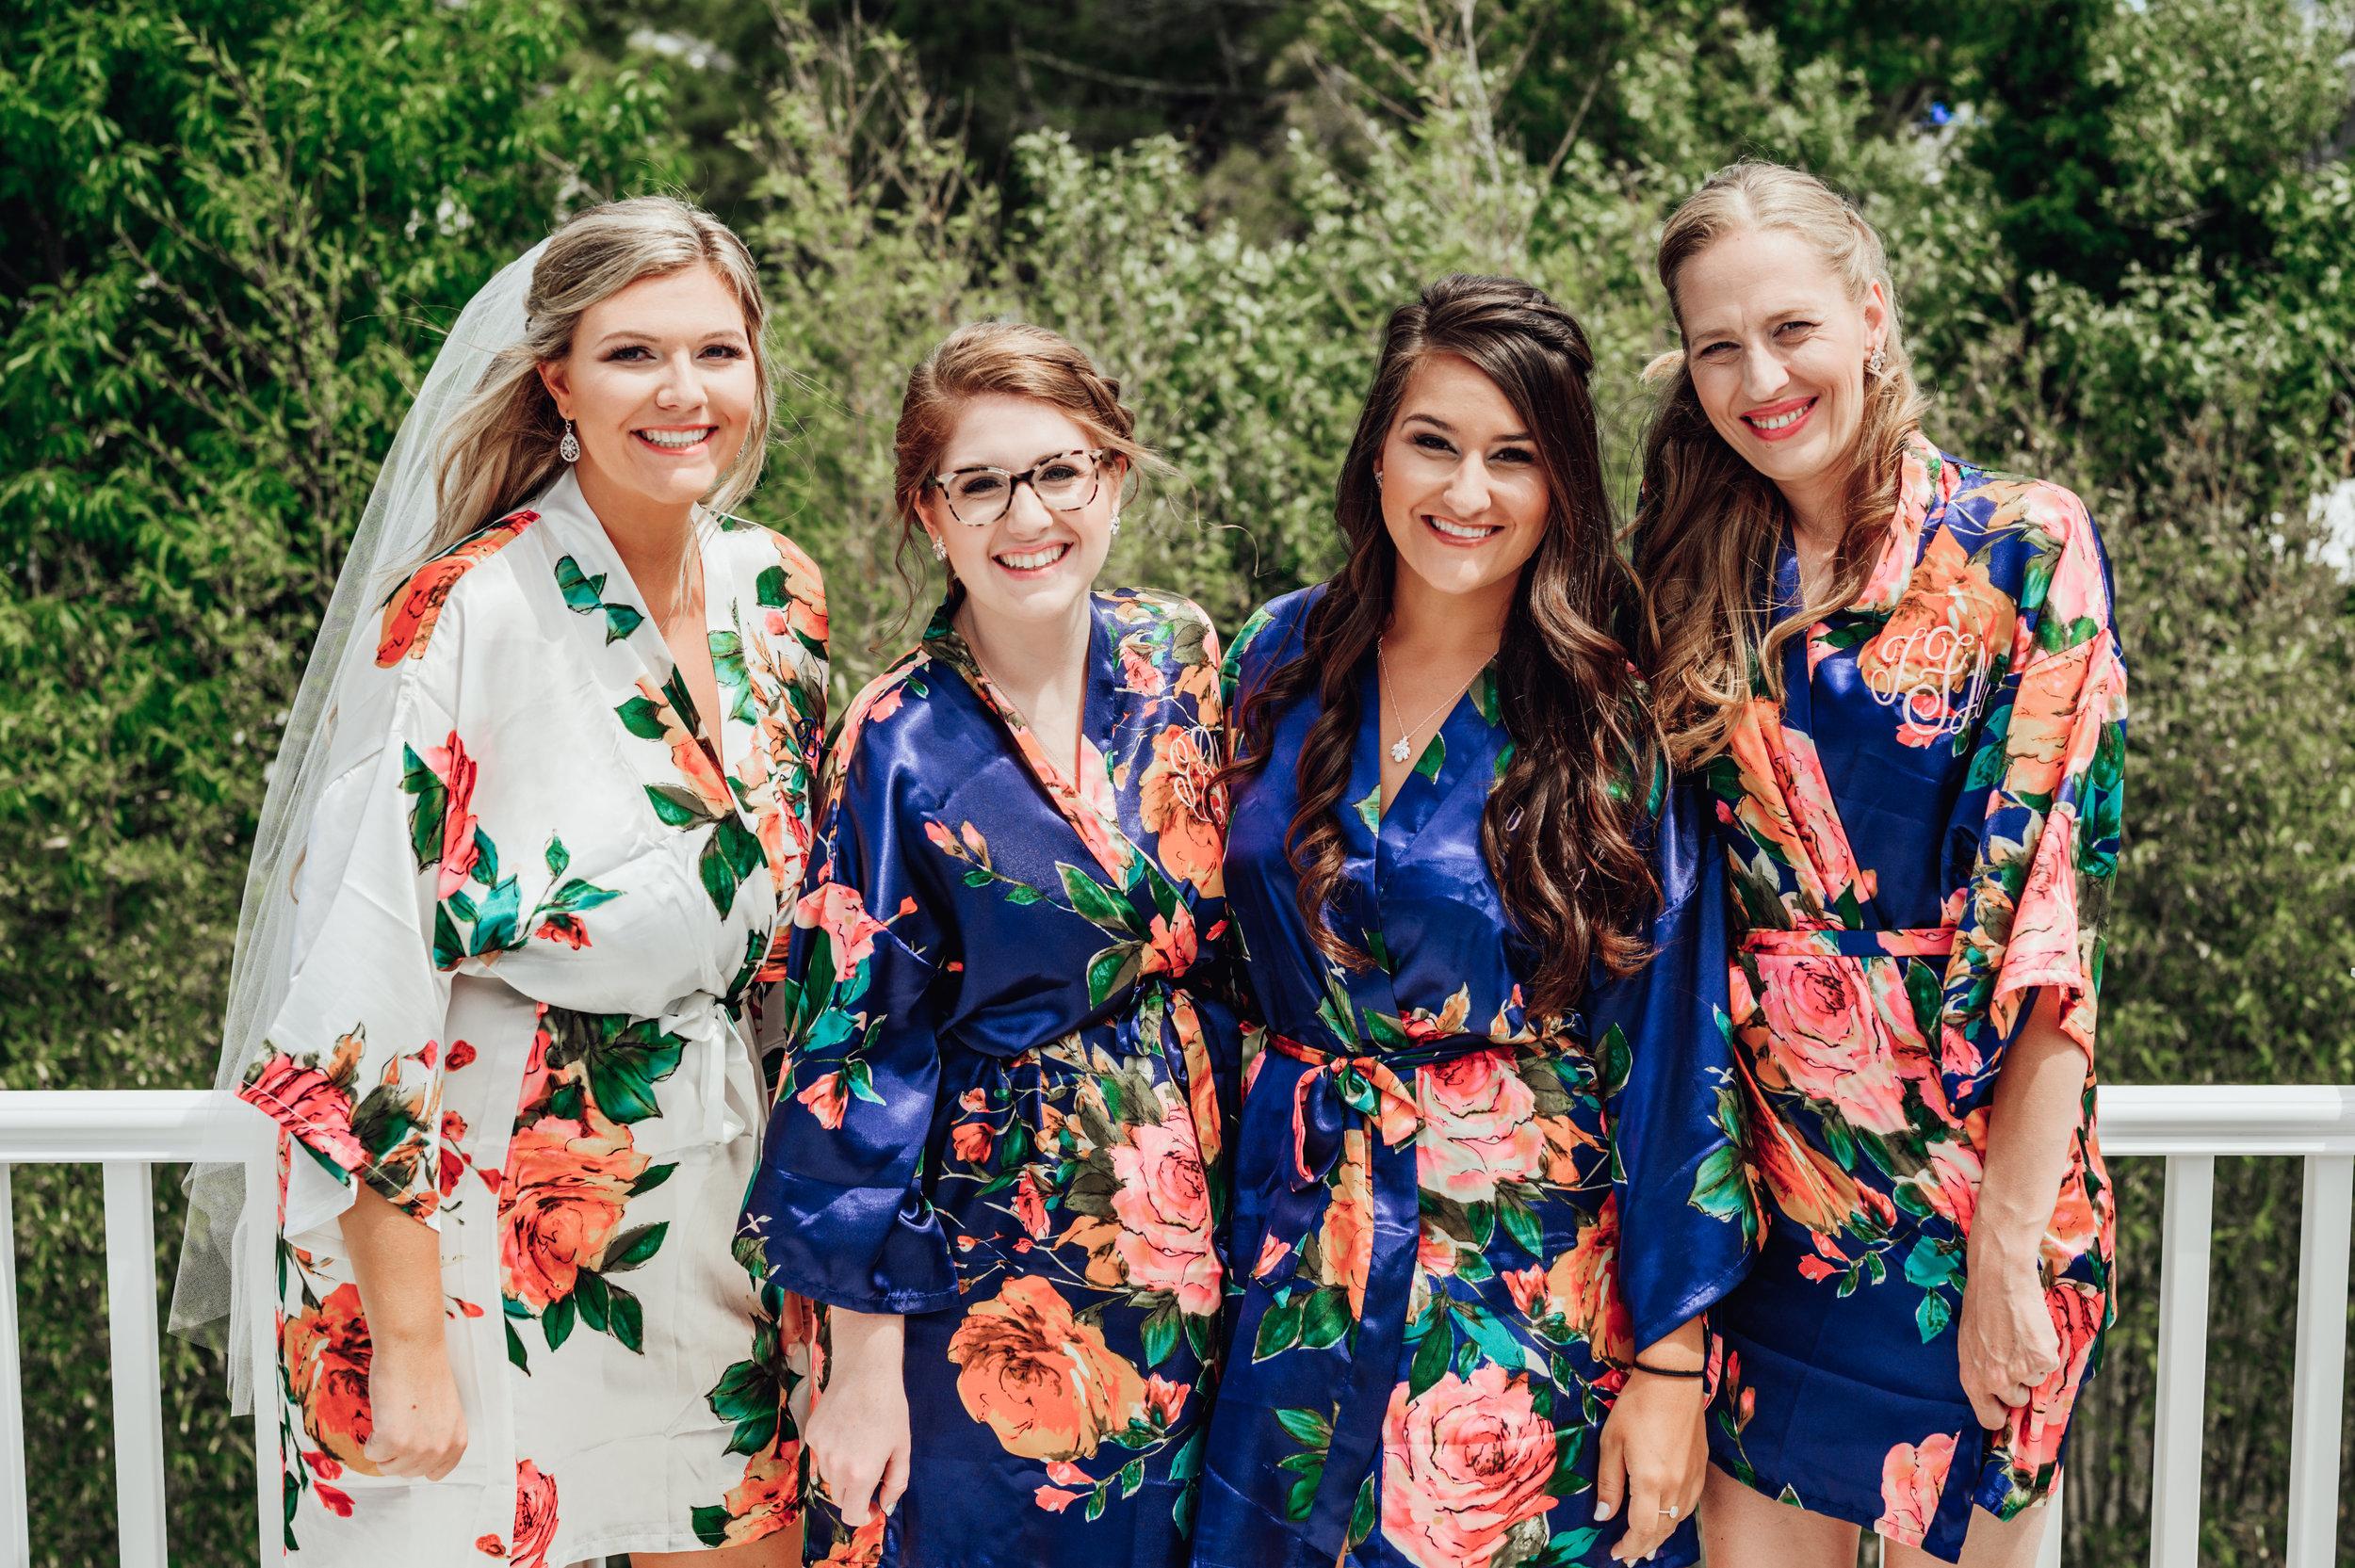 New Jersey Wedding Photographer, Felsberg Photography LBI wedding photography 23.jpg